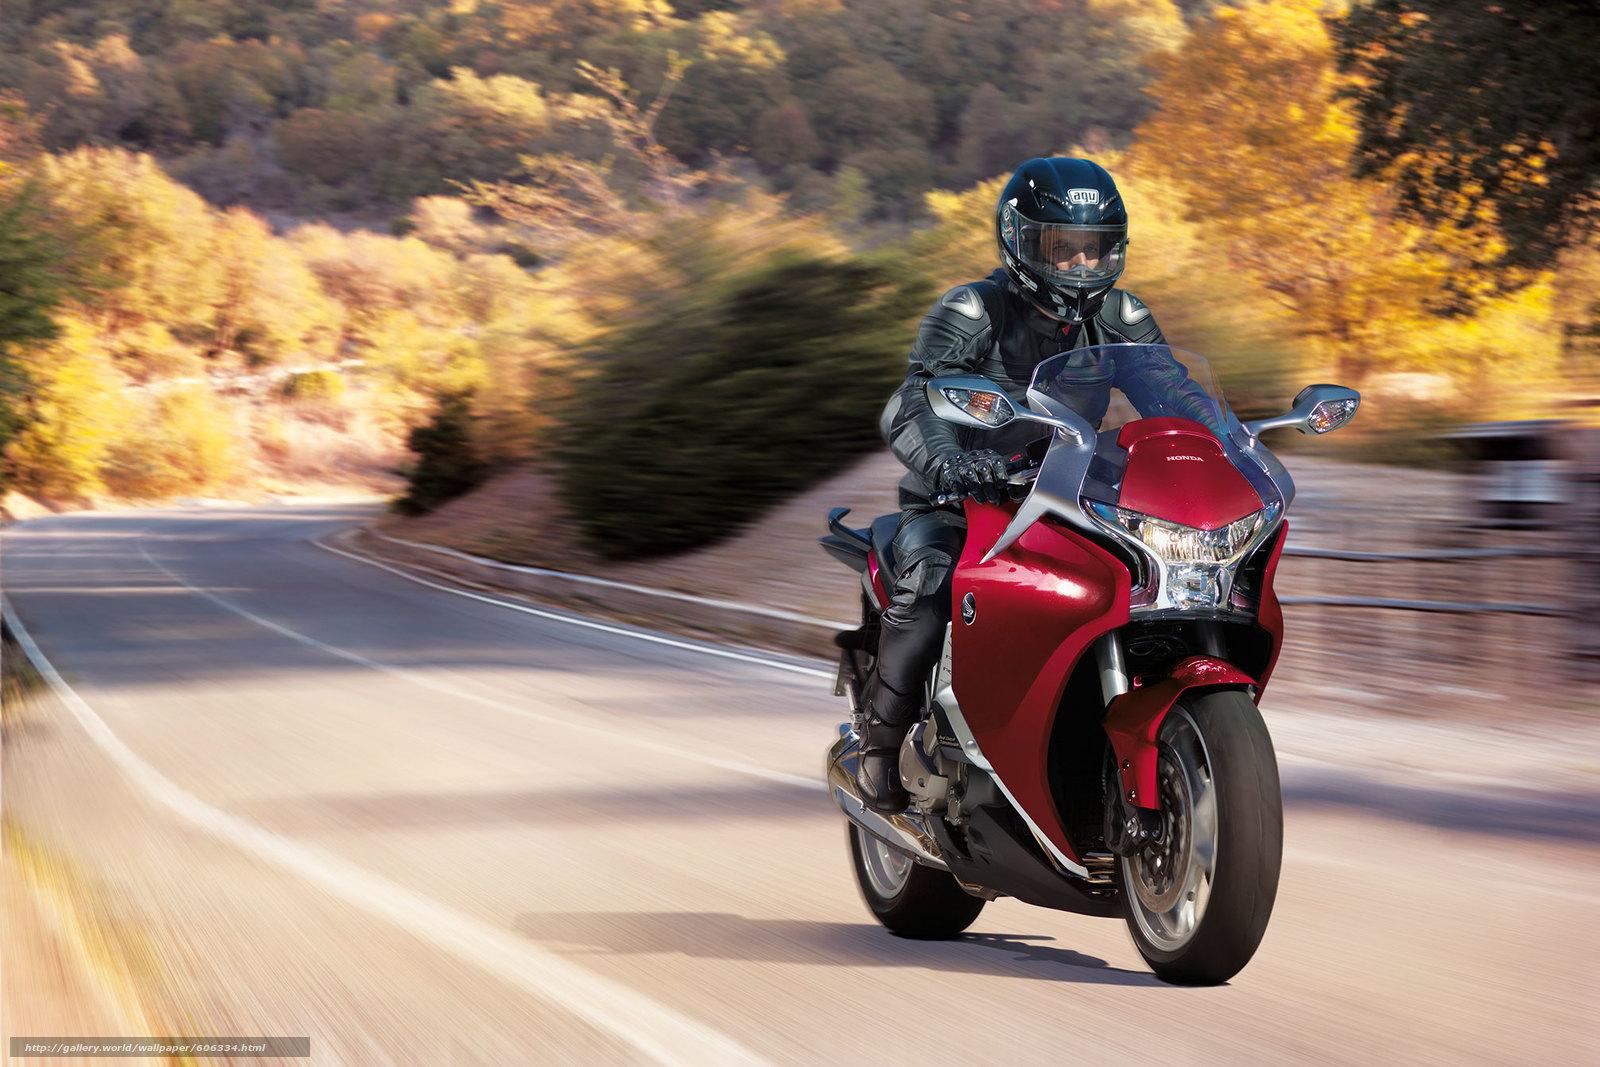 Скачать на телефон обои фото картинку на тему трасса, Honda, VFR1200FA, red bike, разширение 2014x1343